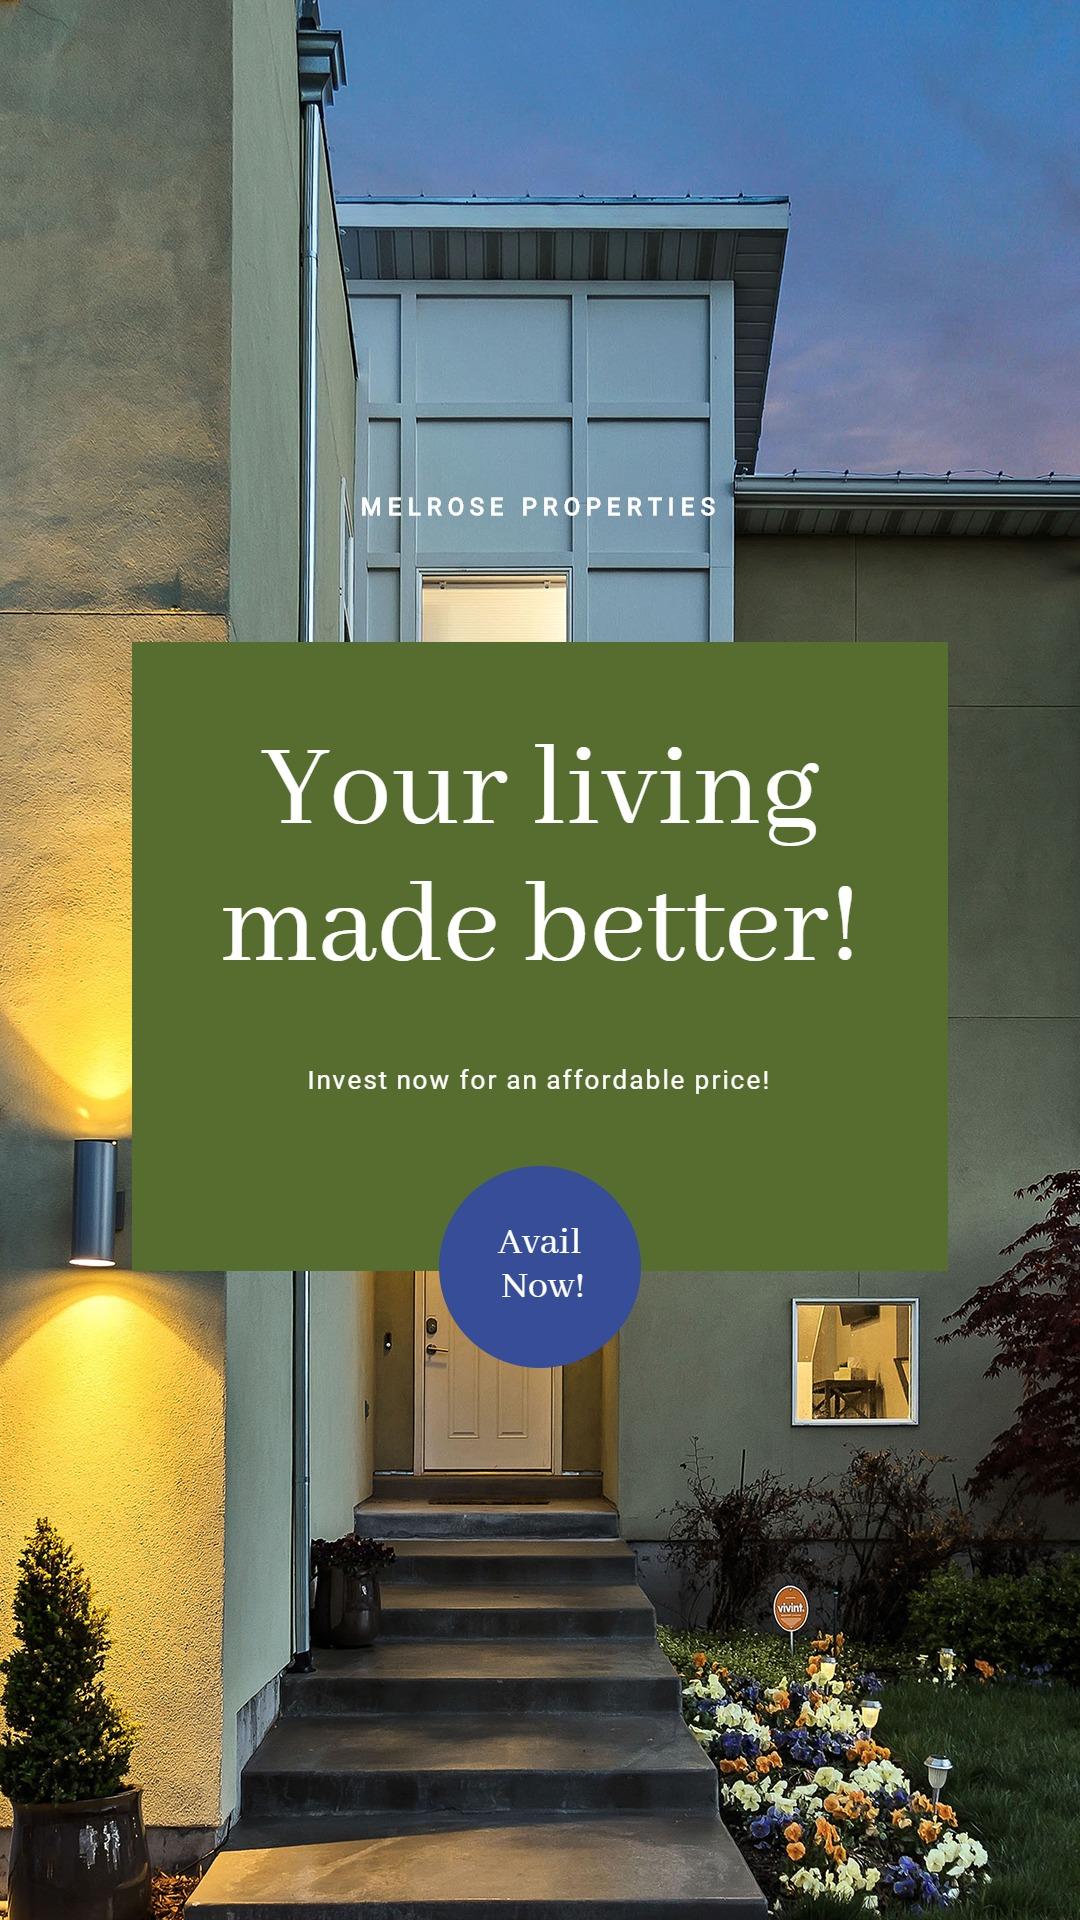 Elegant Real Estate Whatsap Post Template